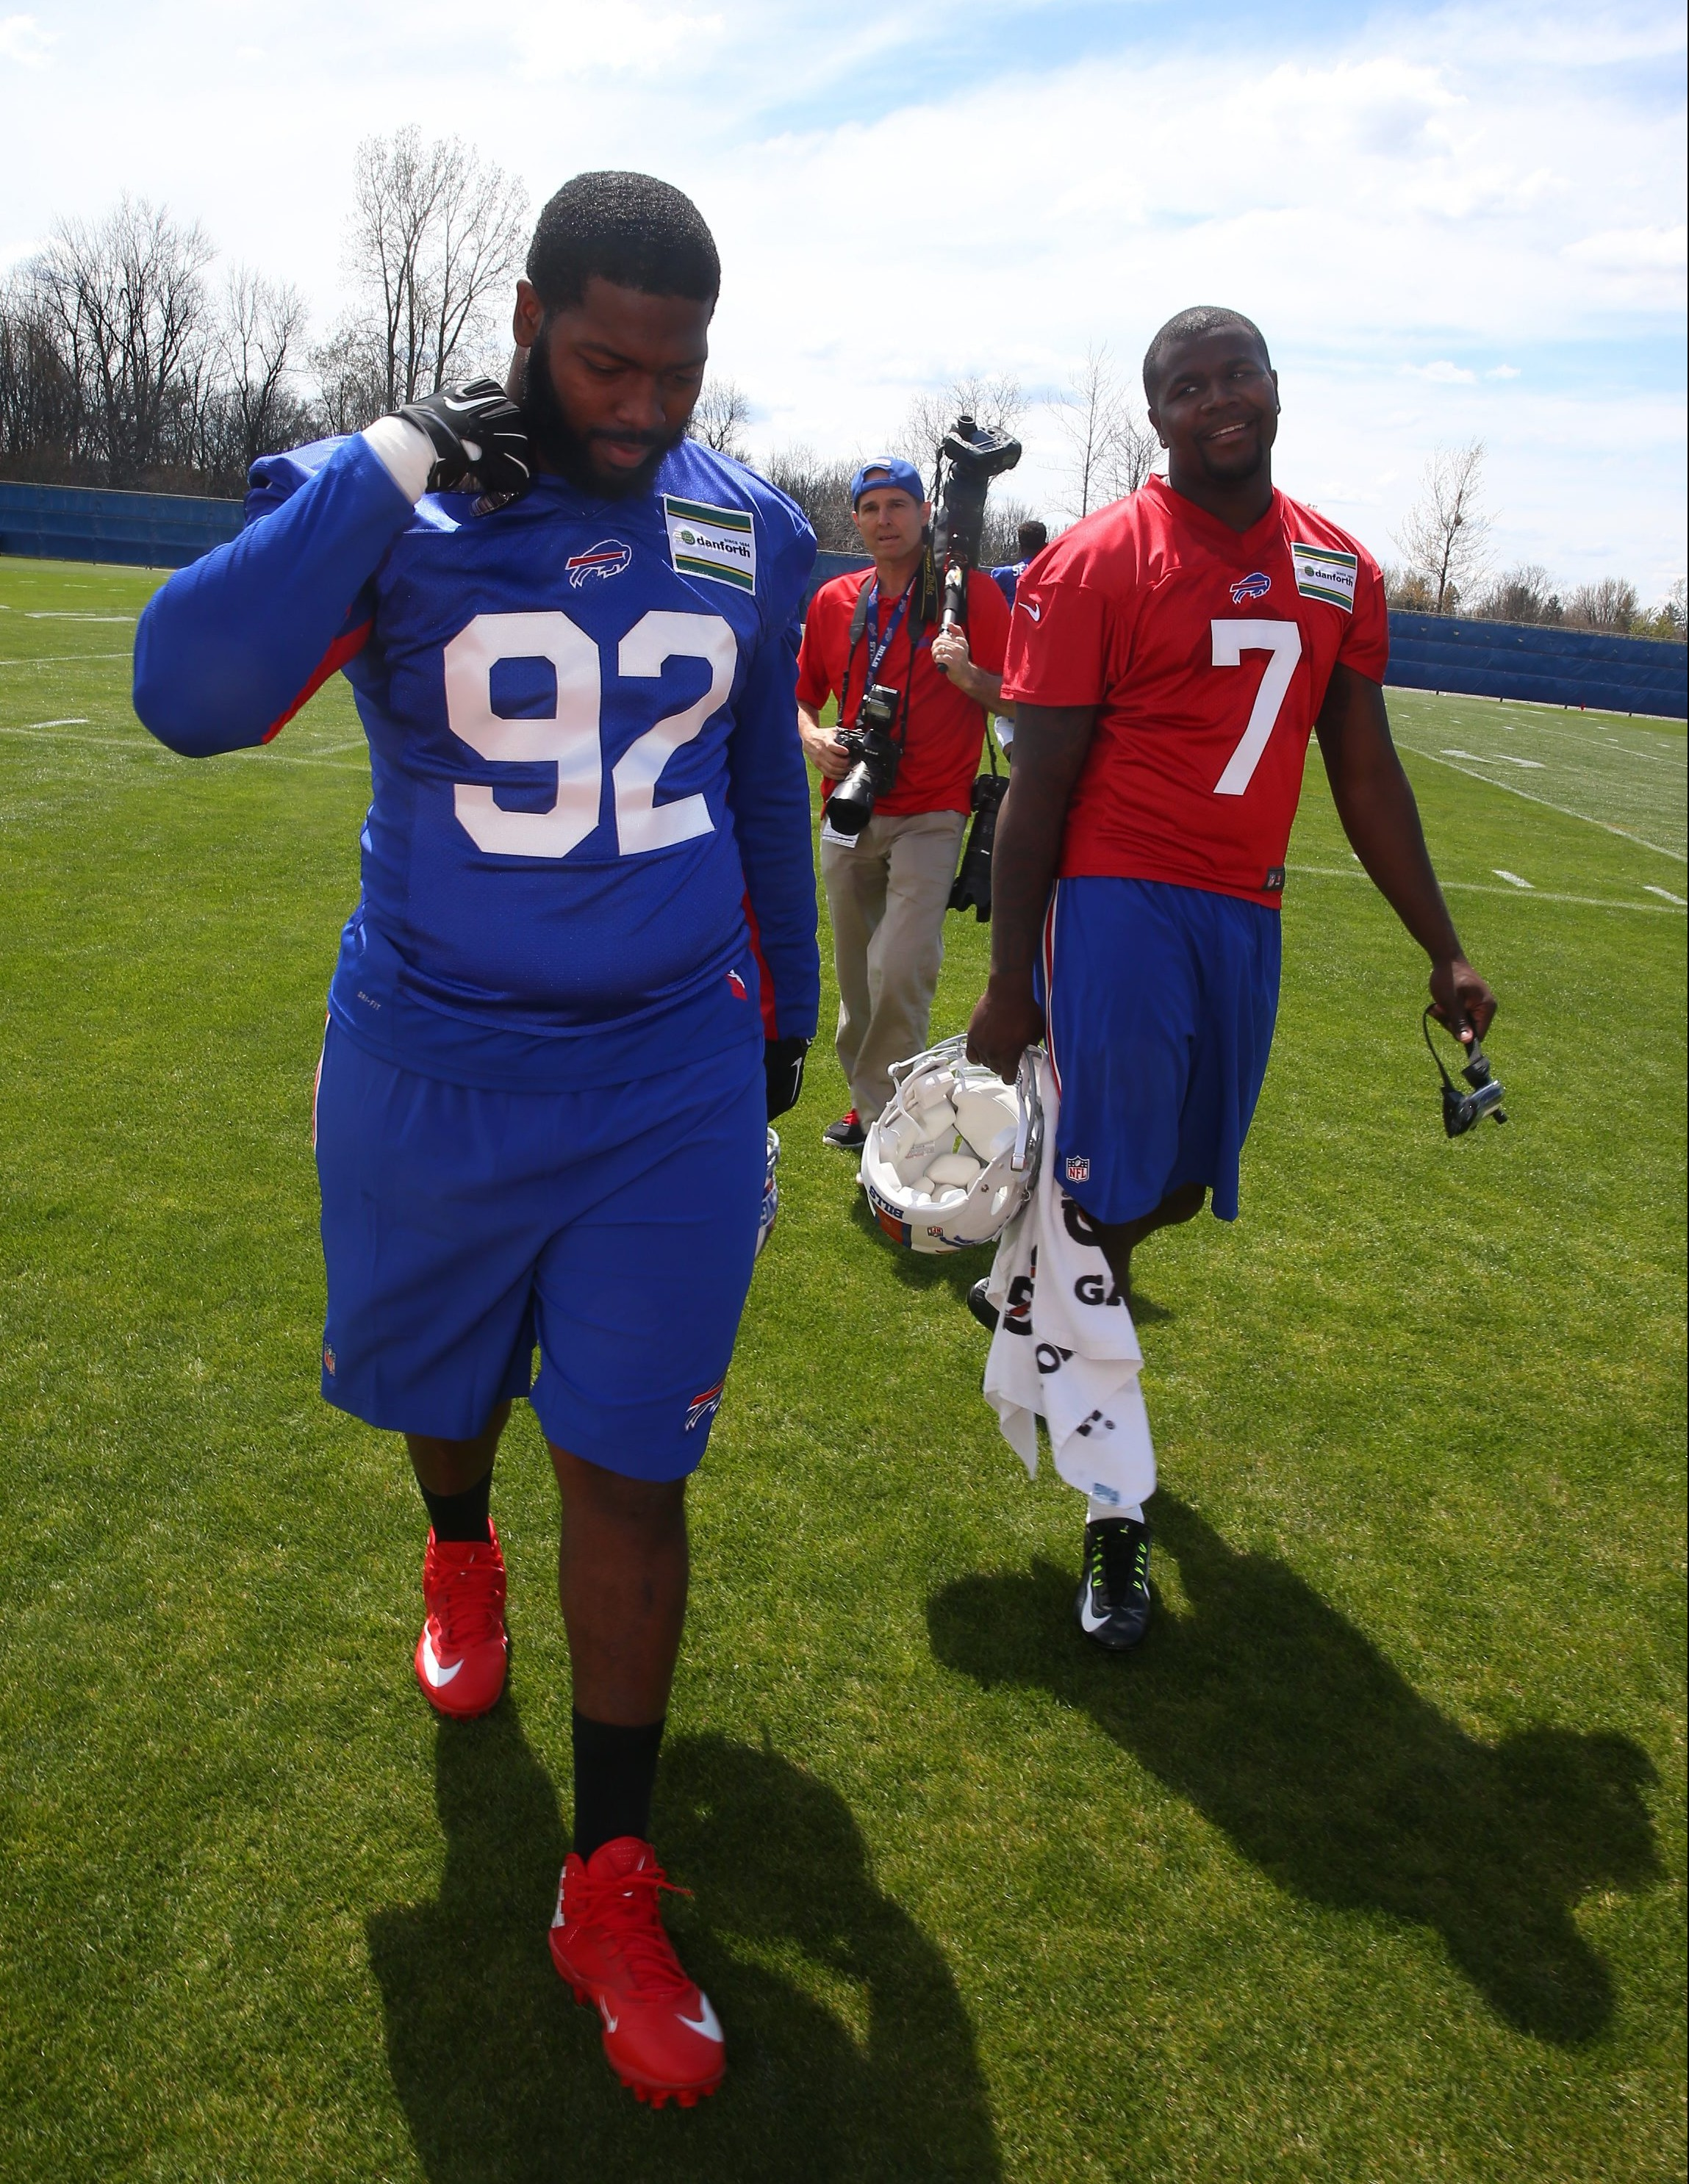 Buffalo Bills players -- and former Ohio State teammates -- Adolphus Washington (92) and Cardale Jones (7) walk off the practice field. (John Hickey/Buffalo News)